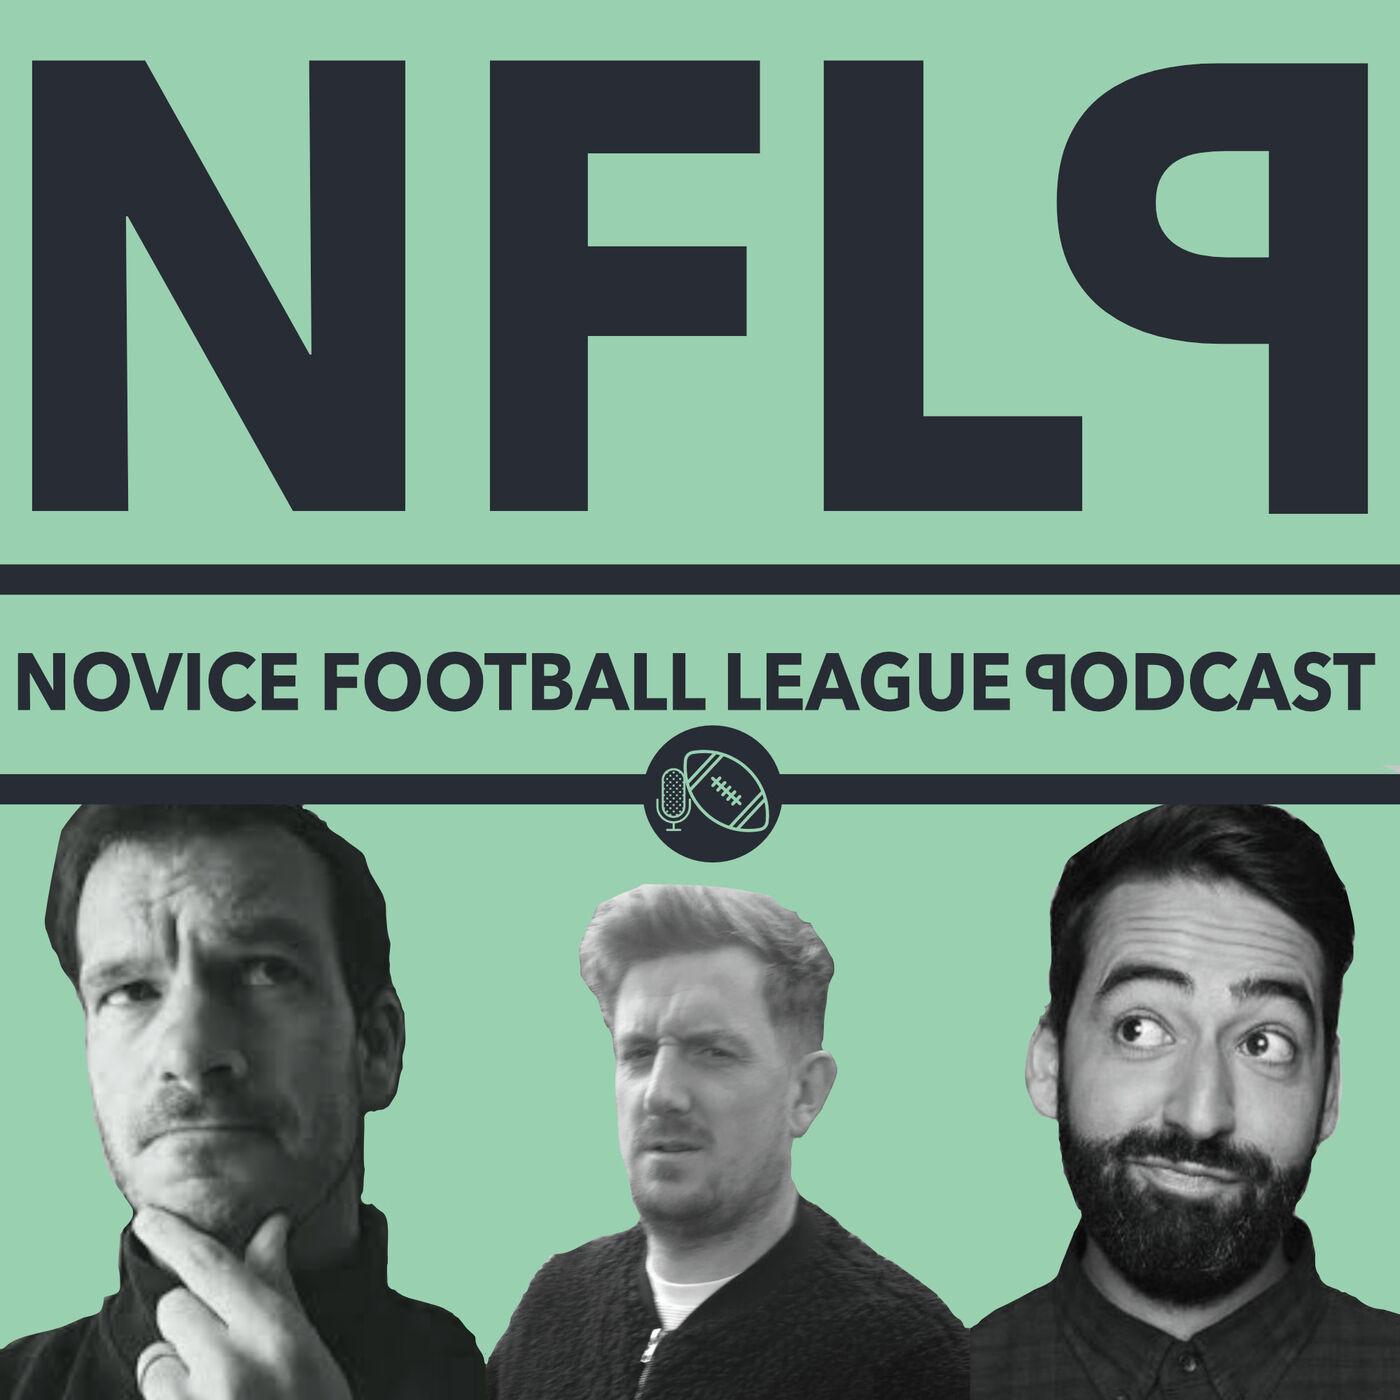 Novice Football League Podcast